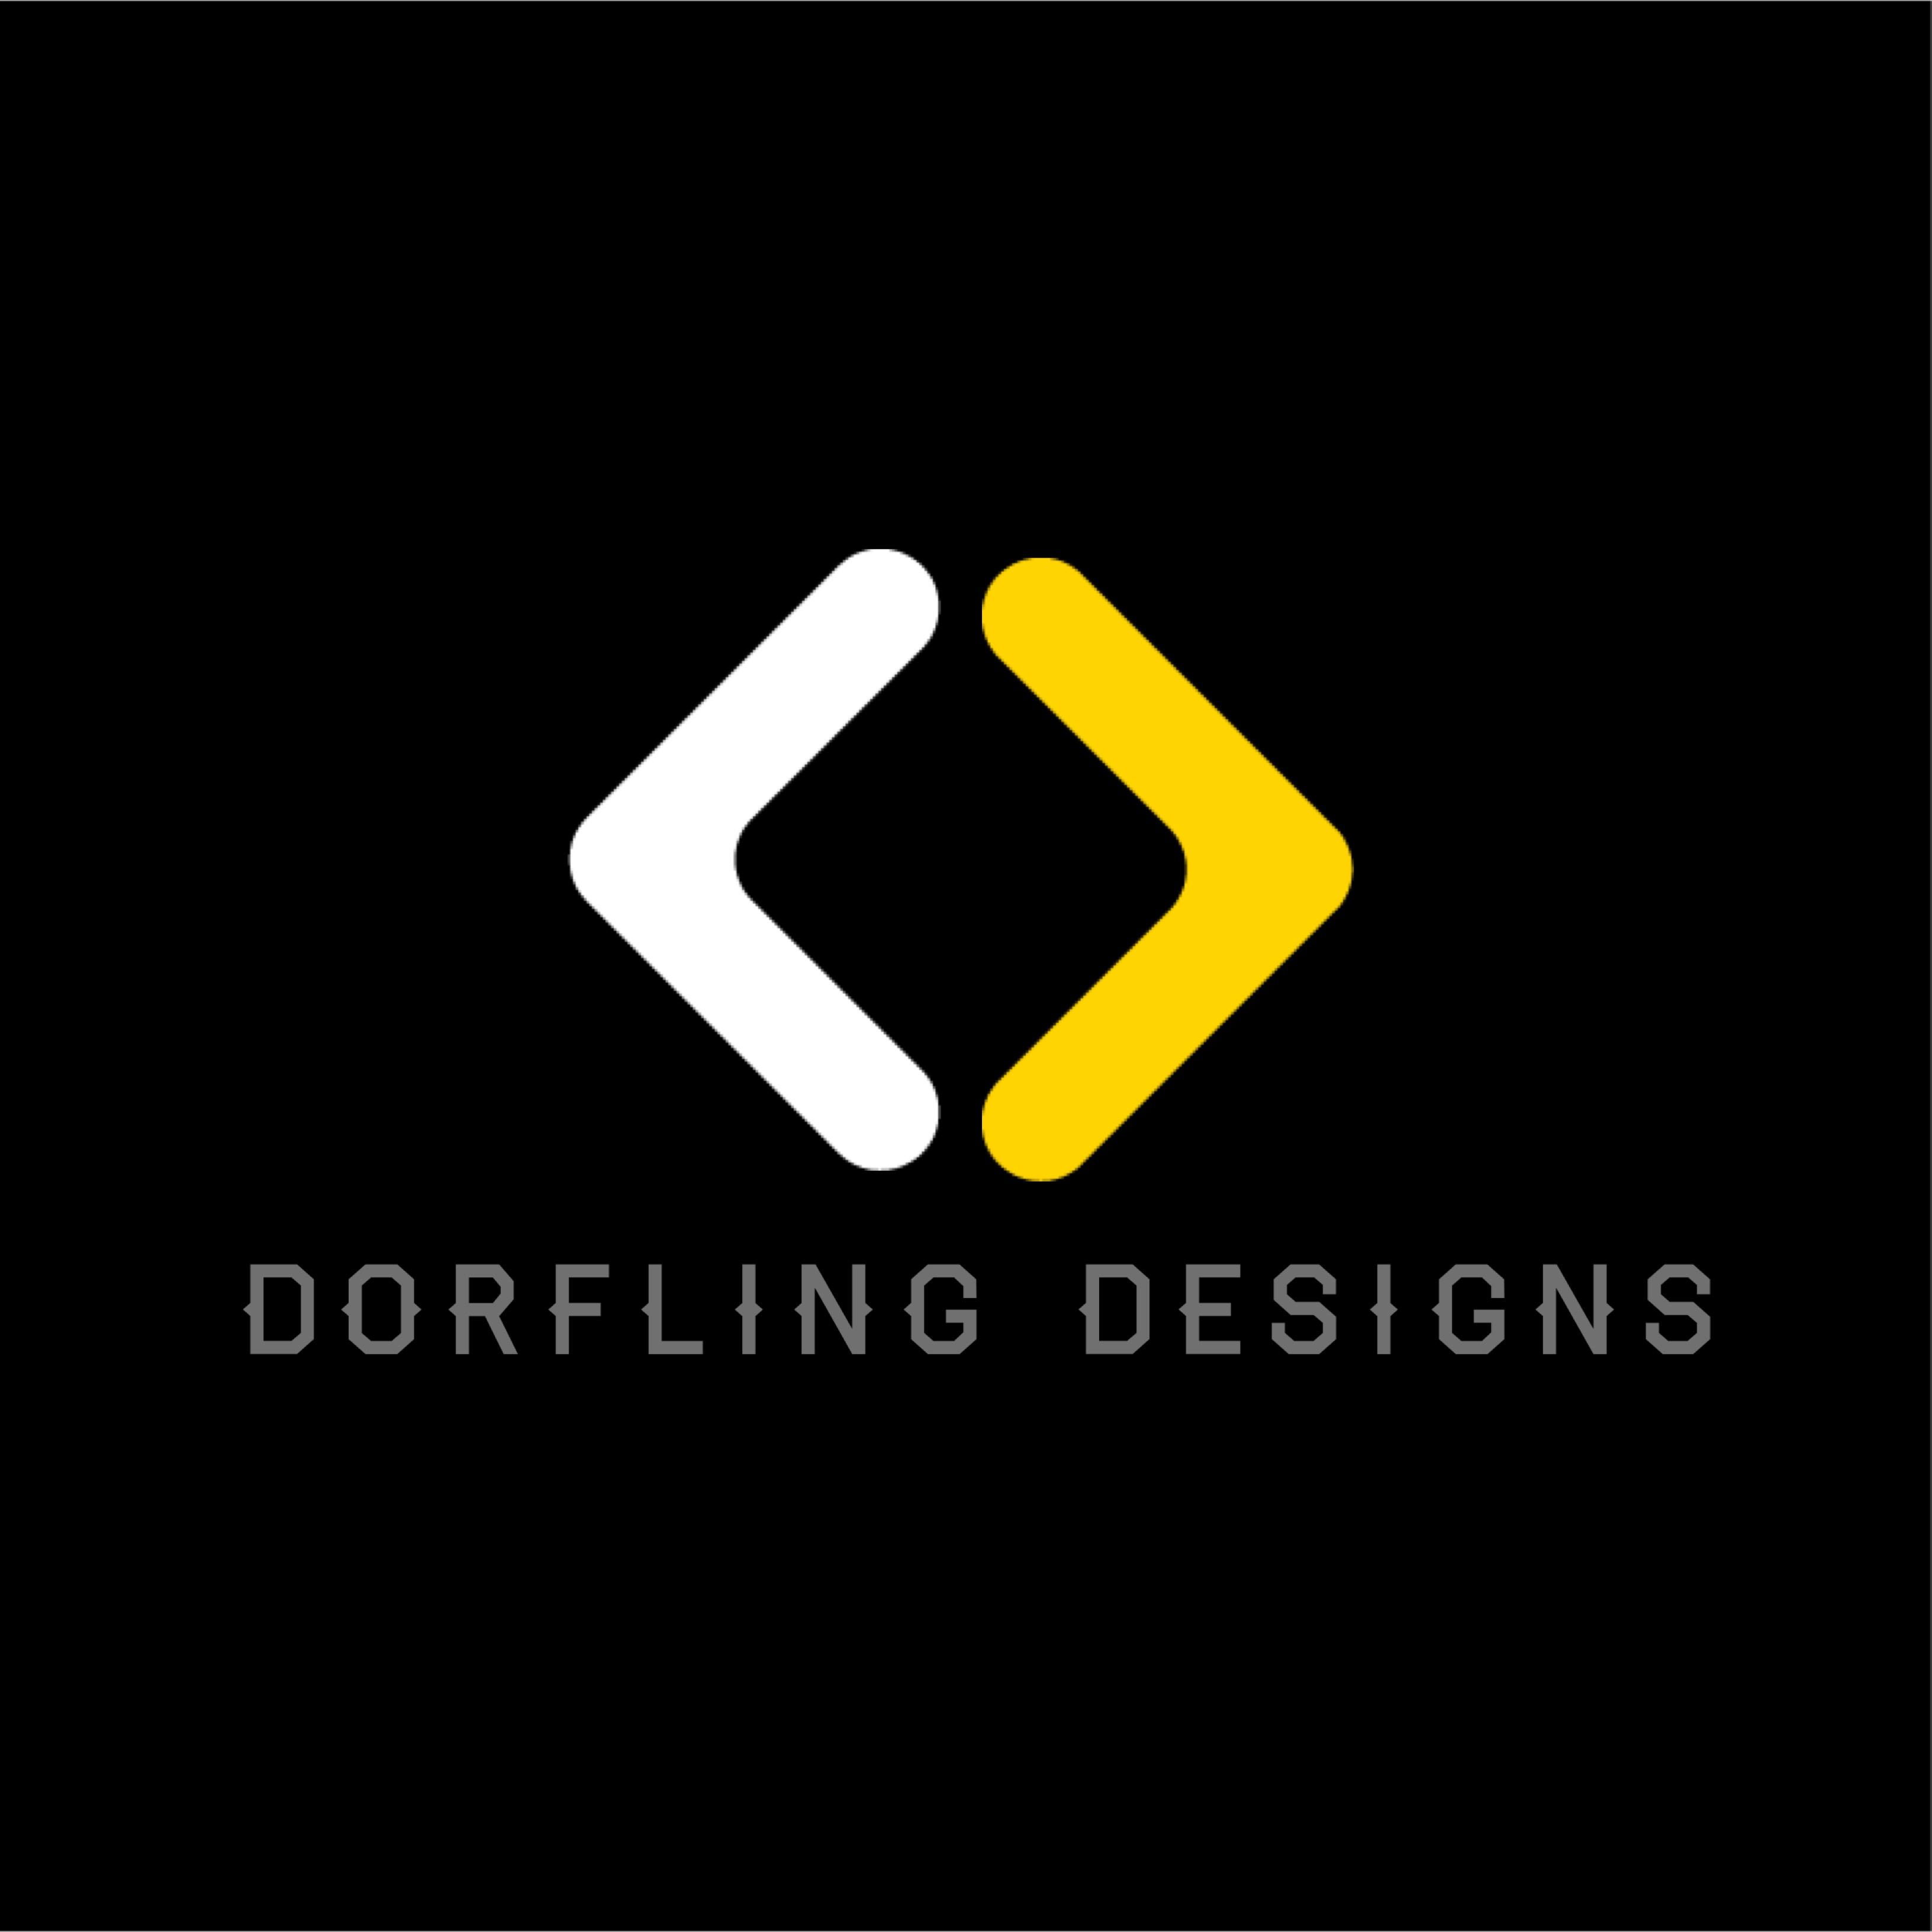 Dorfling Designs